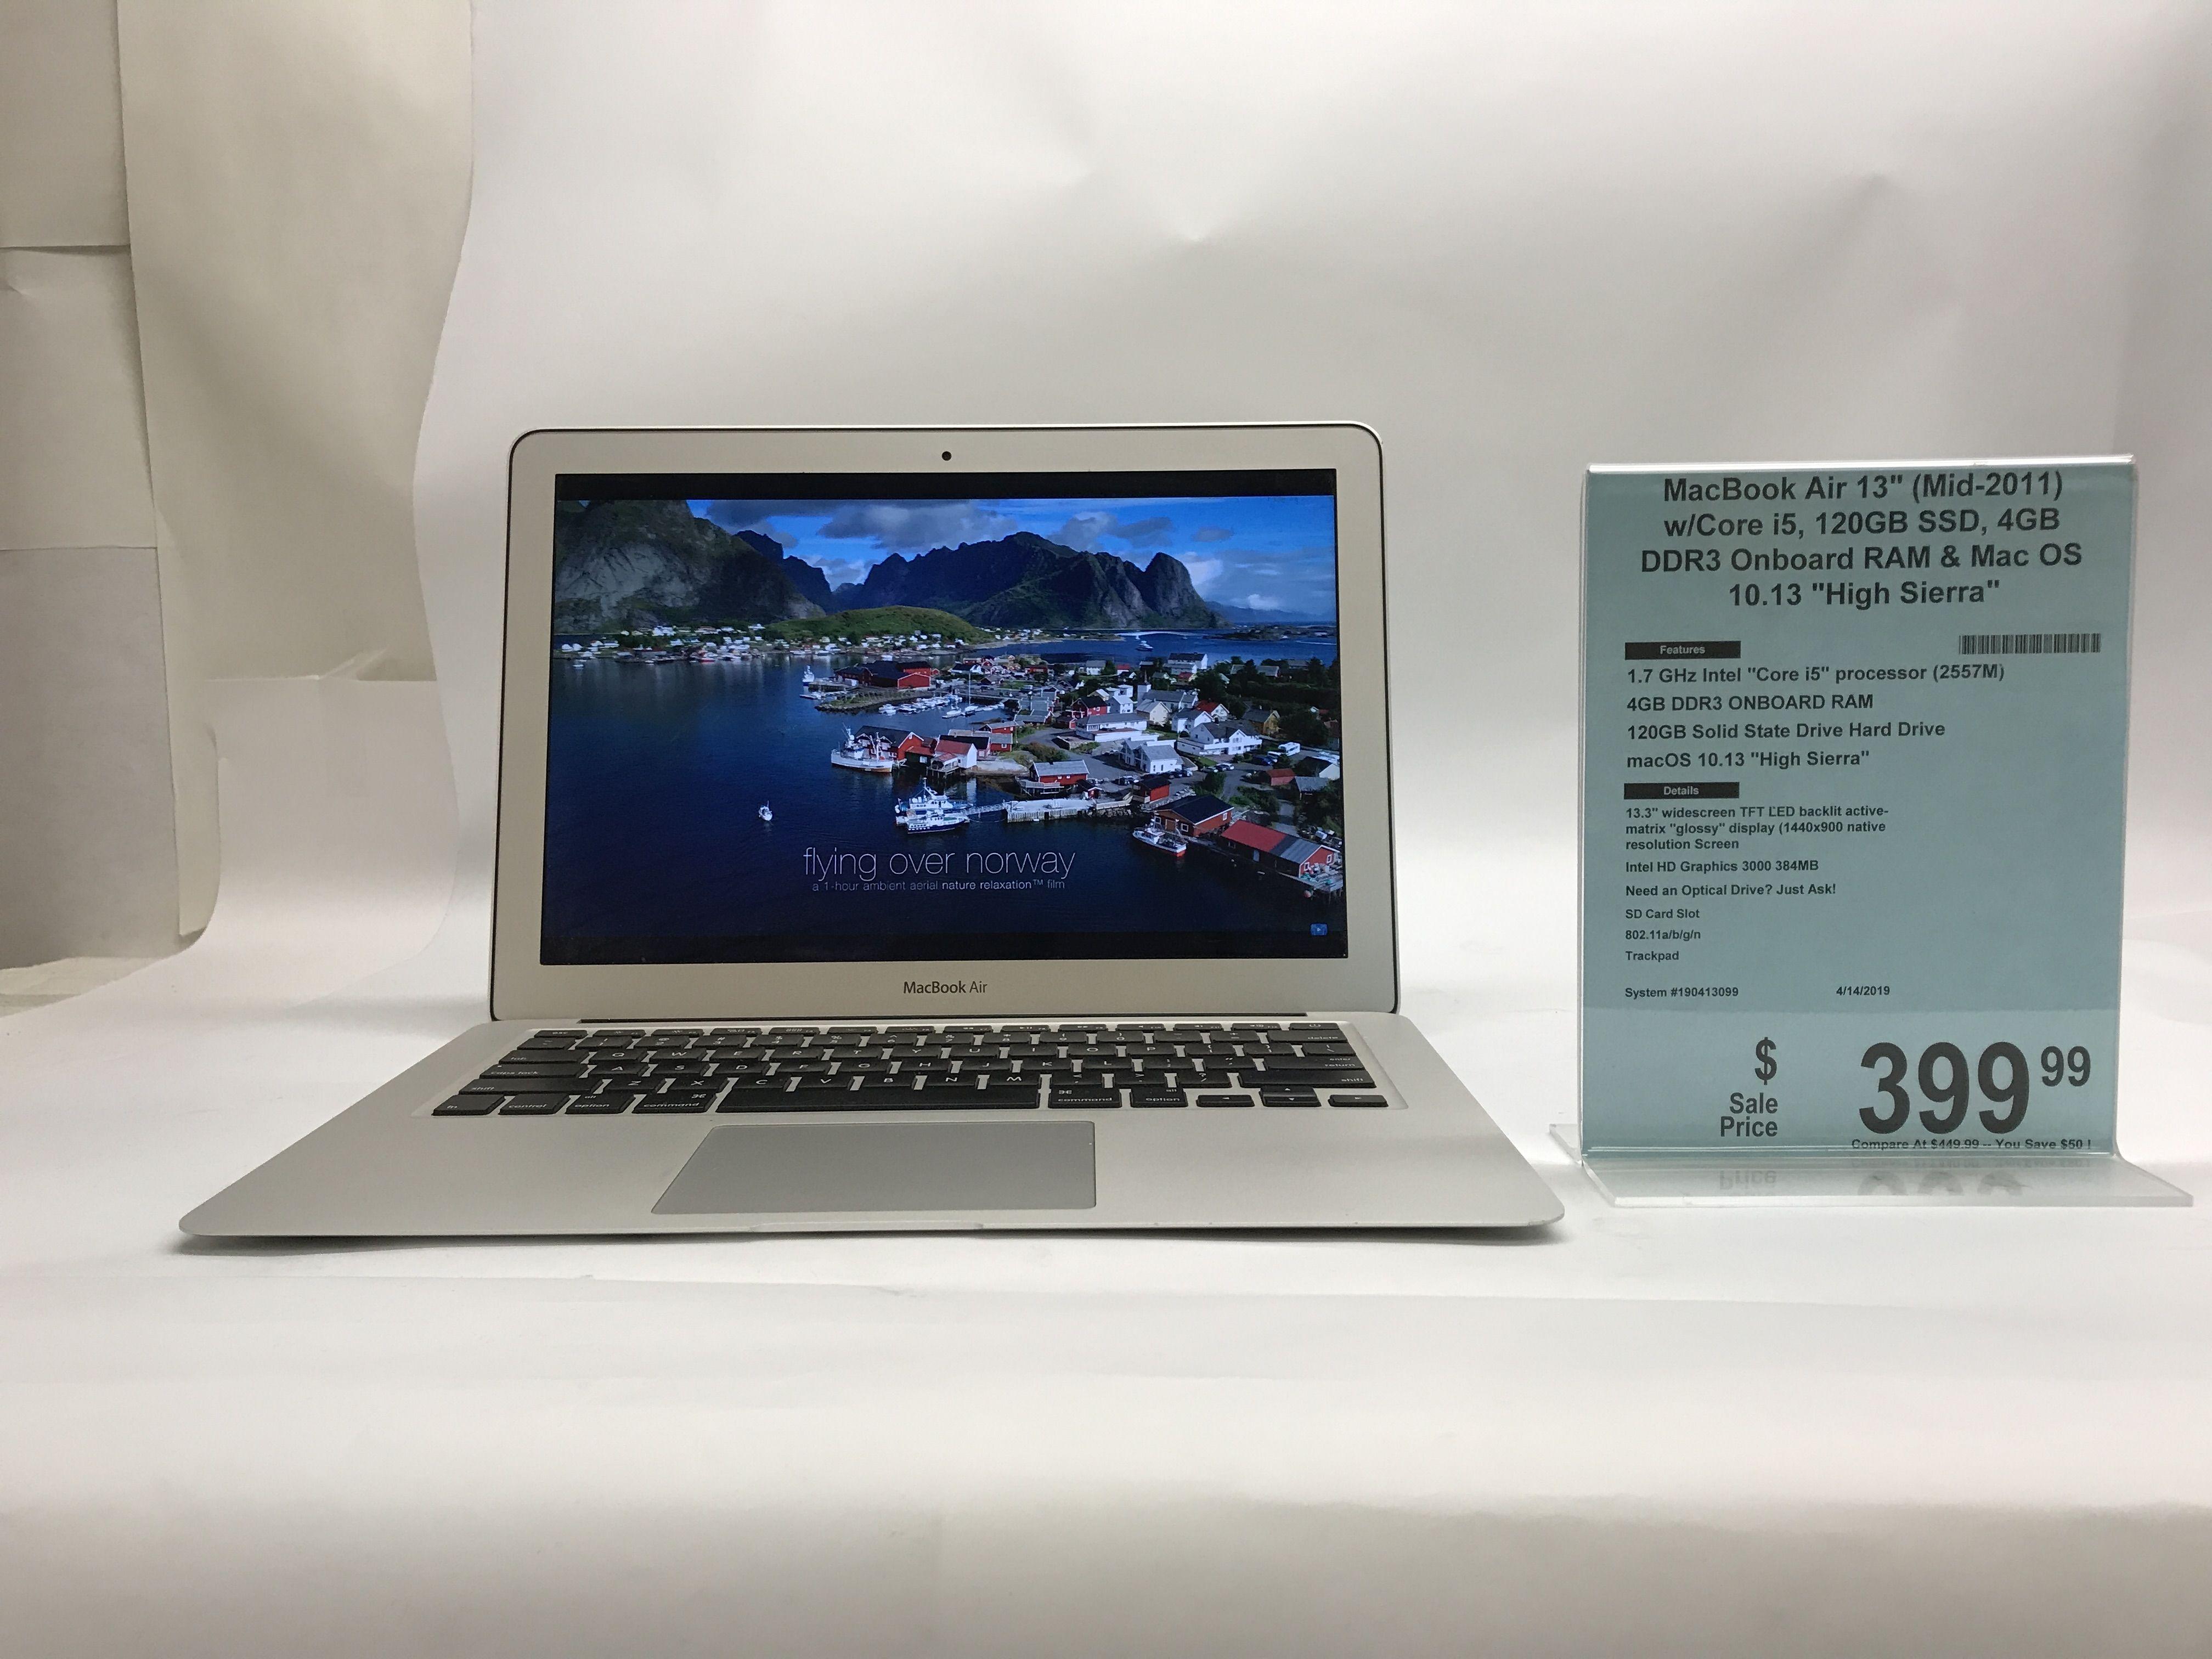 Great deal down at Action Computers, Inc.! Macbook Air at